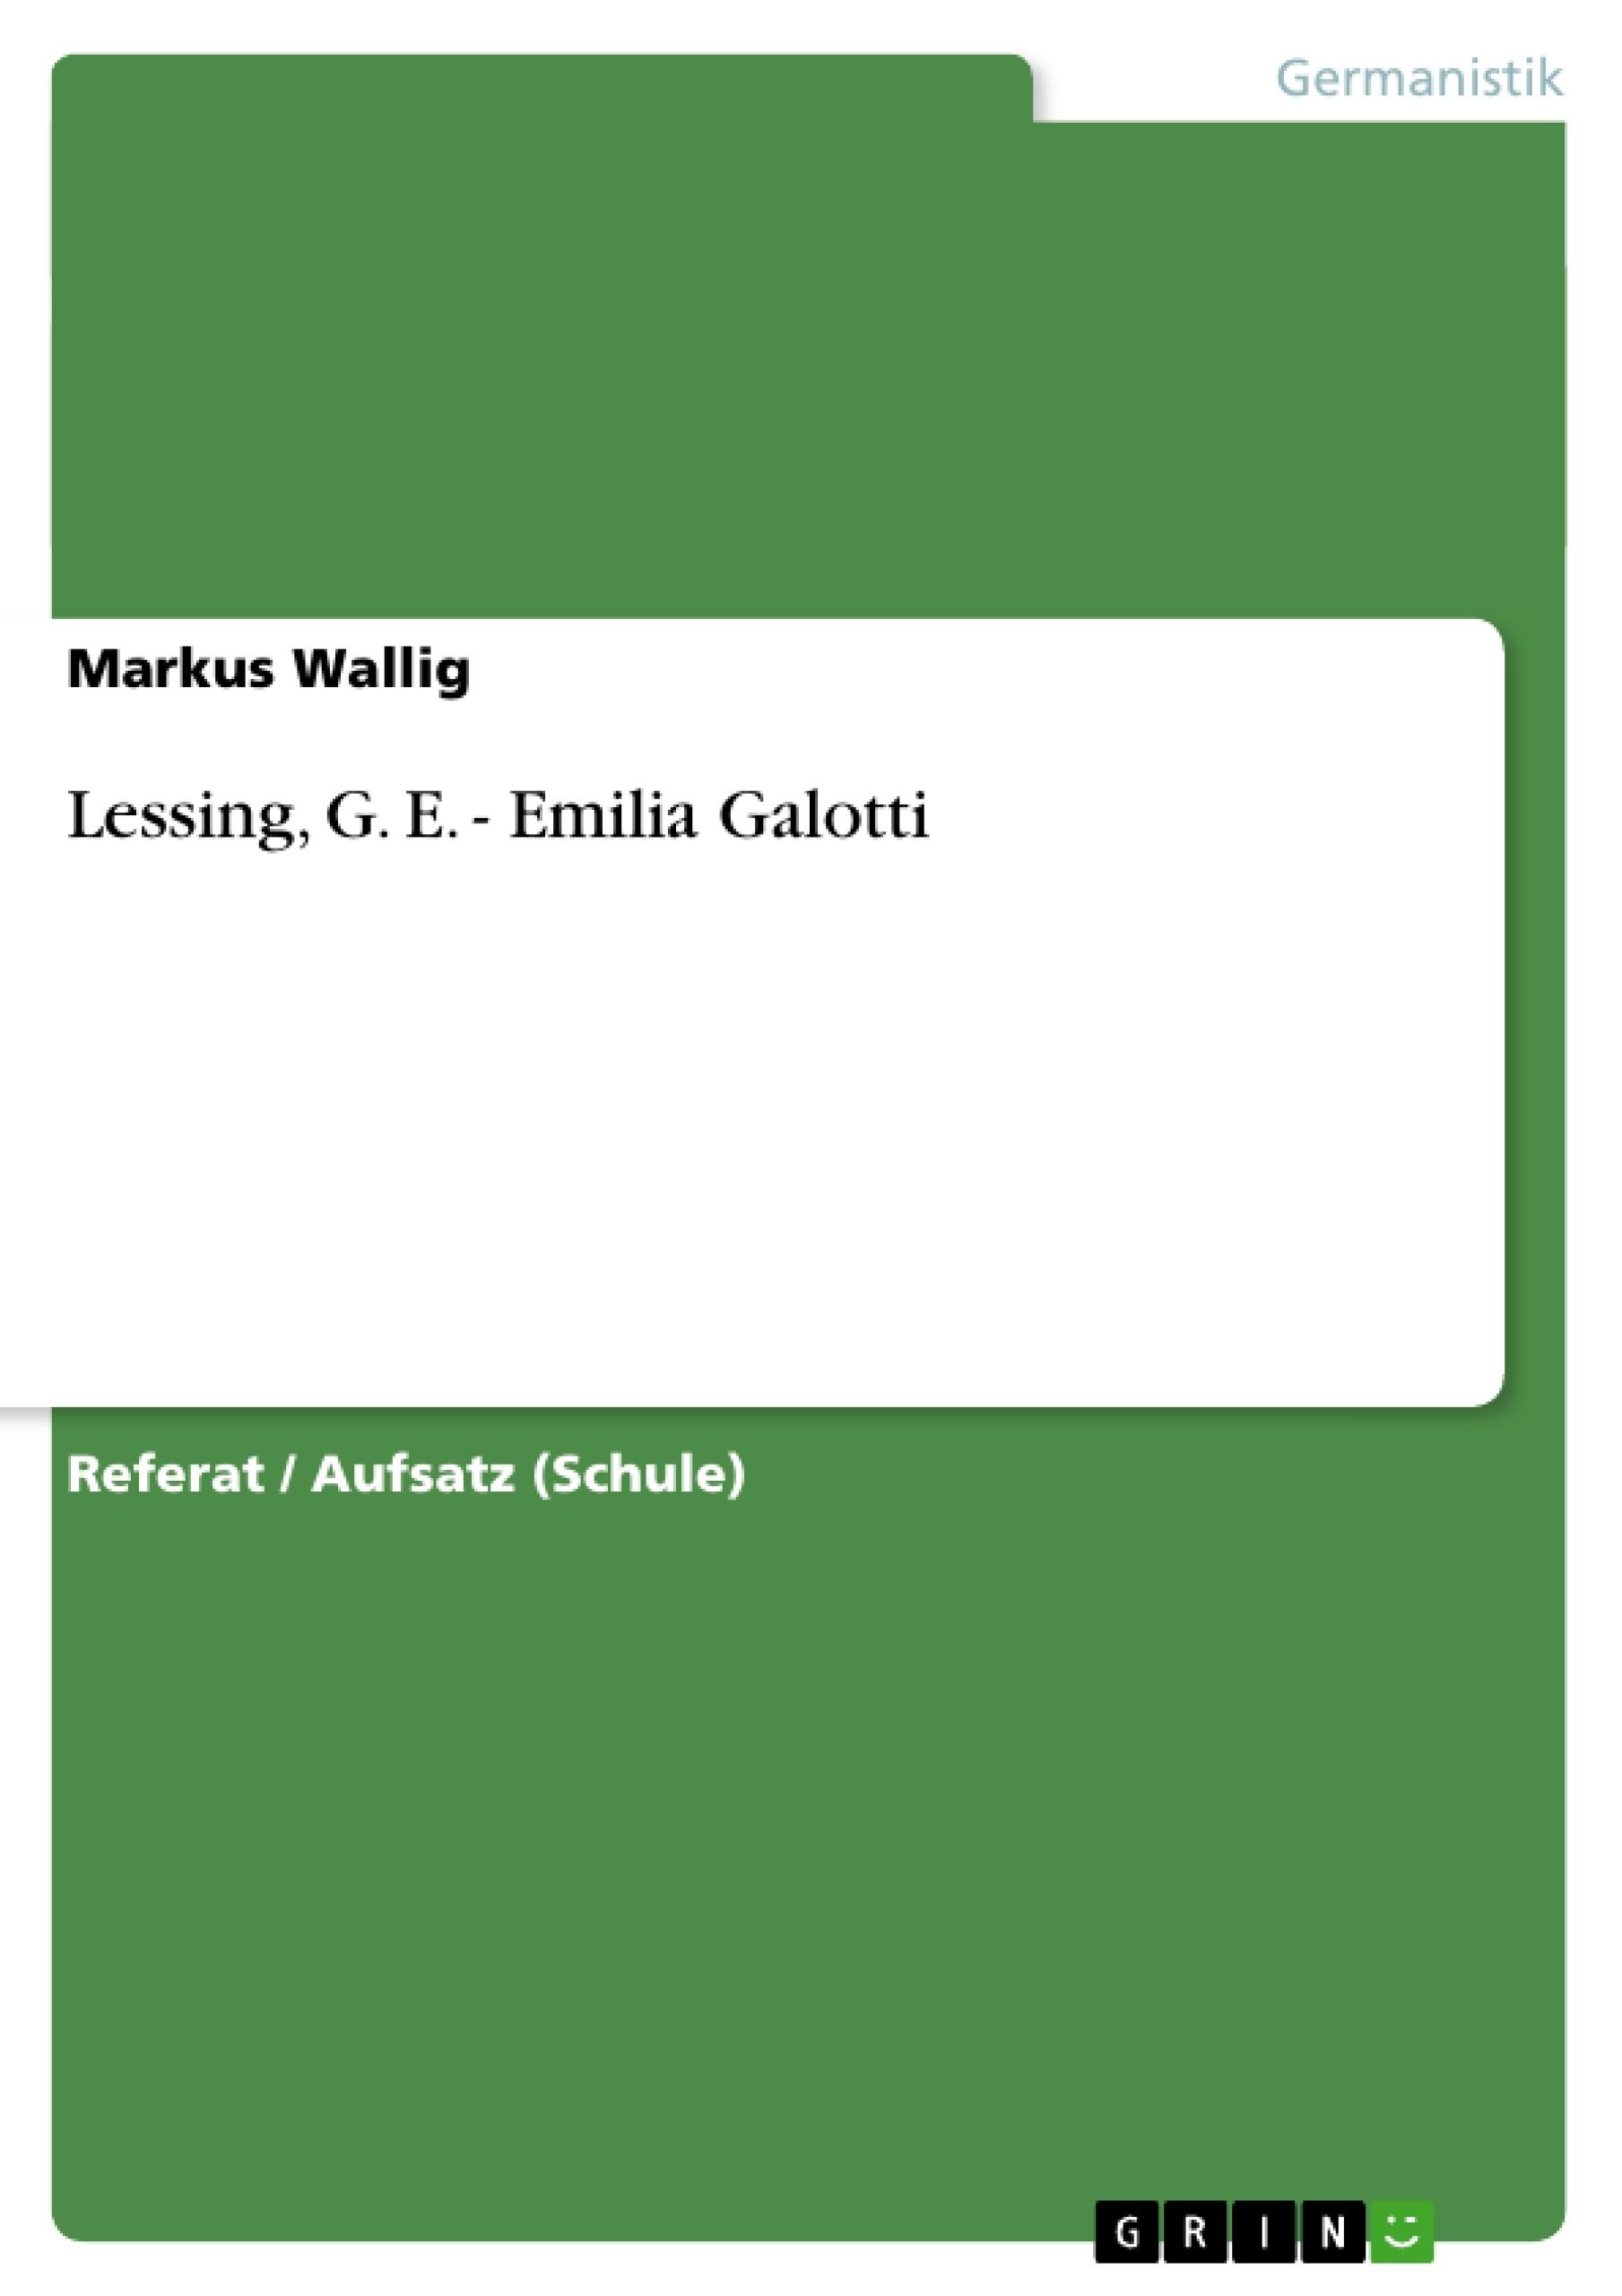 Titel: Lessing, G. E. - Emilia Galotti